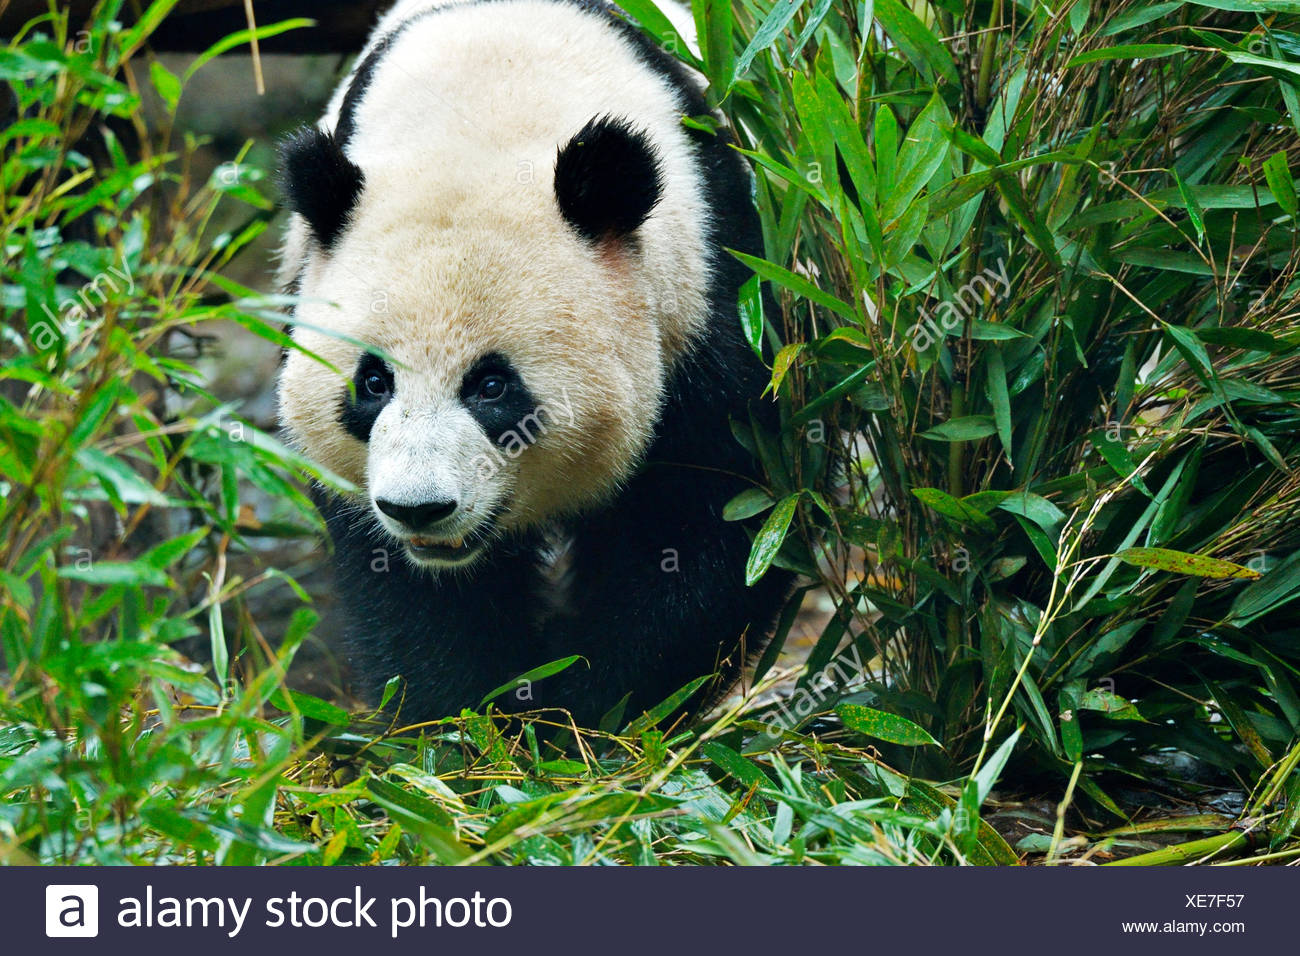 Giant Panda (Ailuropoda melanoleuca), captive, Chengdu Research Base of Giant Panda Breeding or Chengdu Panda Base, Chengdu - Stock Image